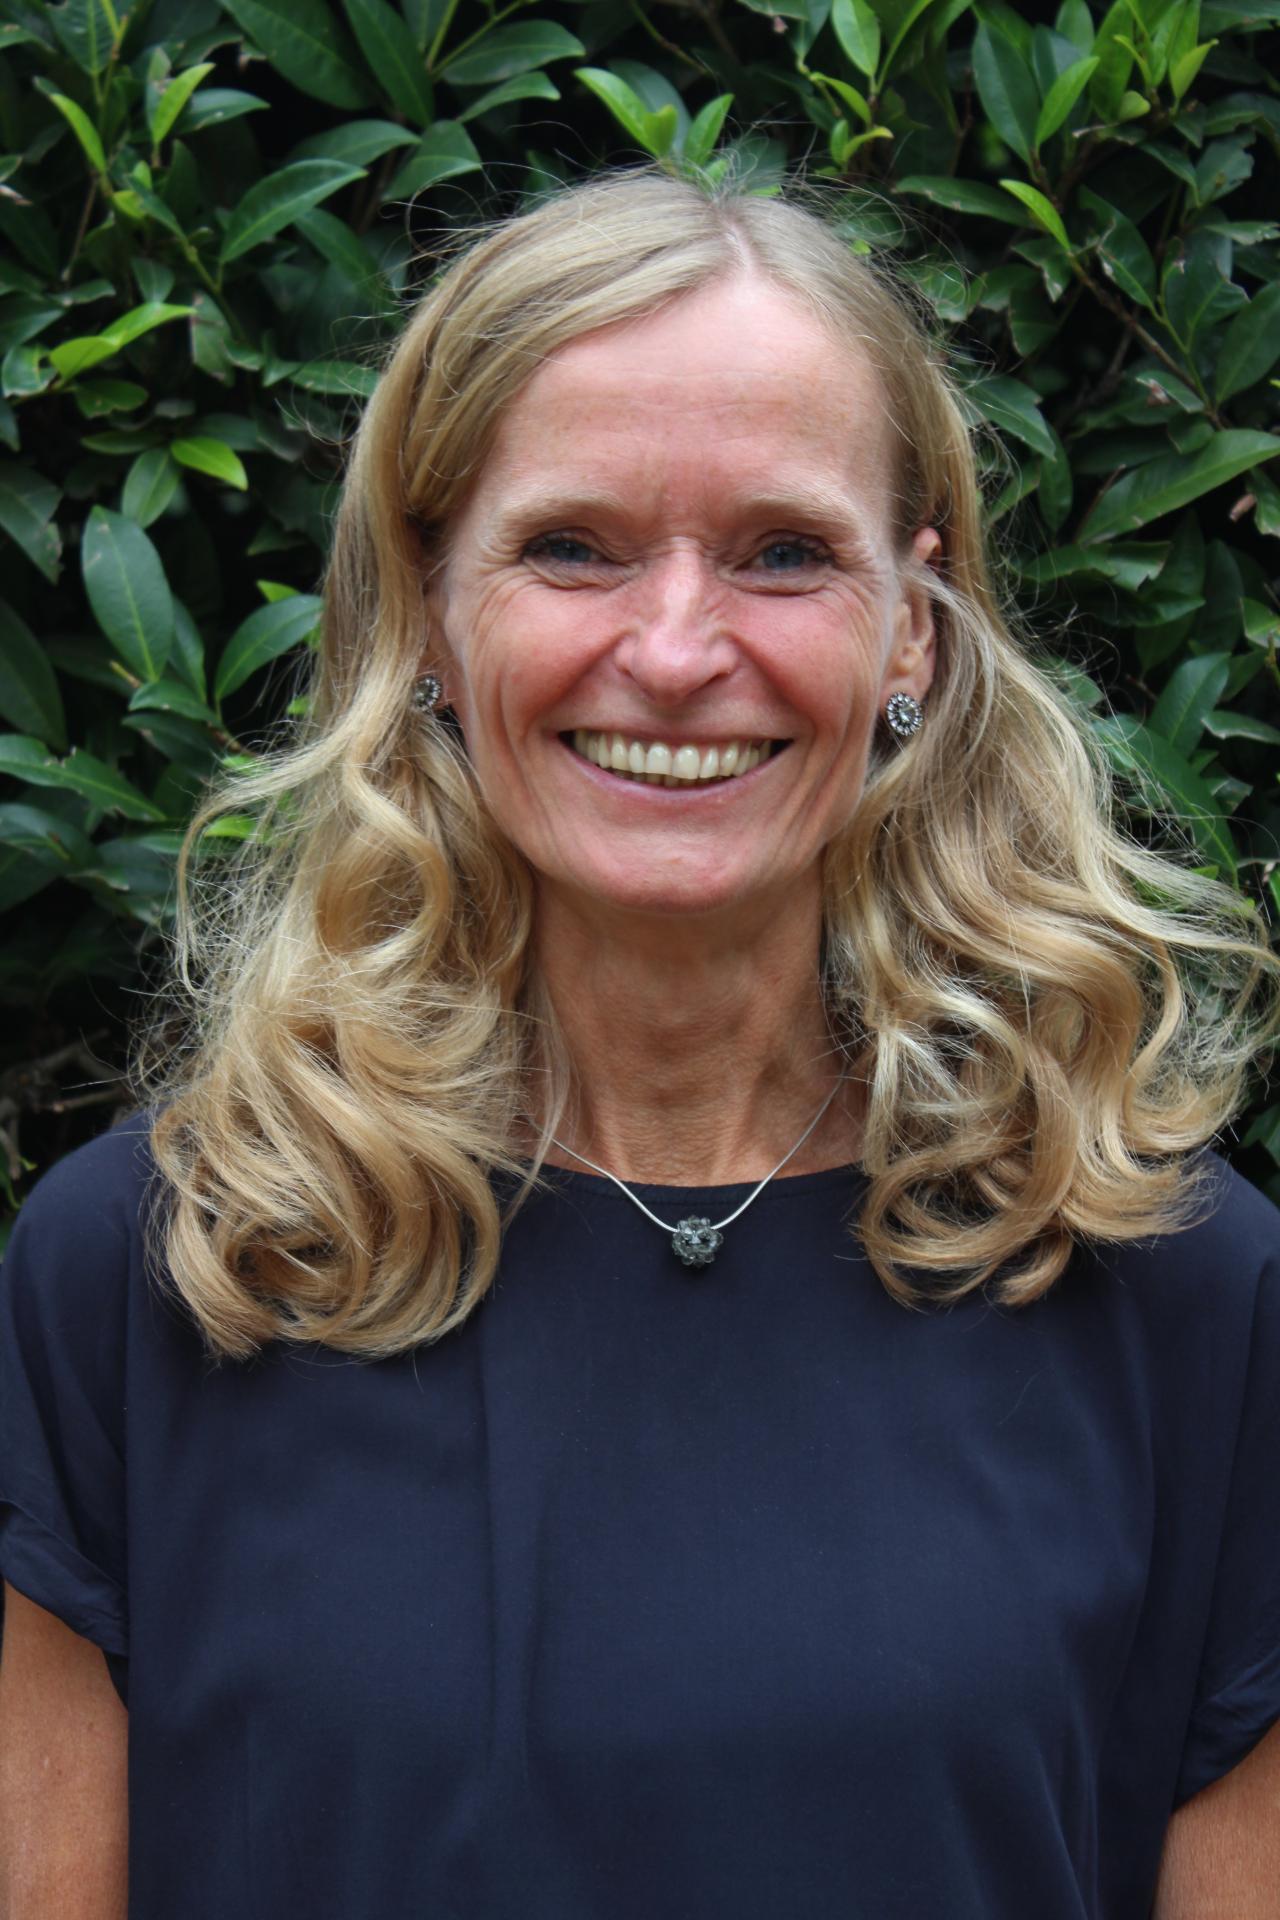 Kerstin Eichhoff-Schinke